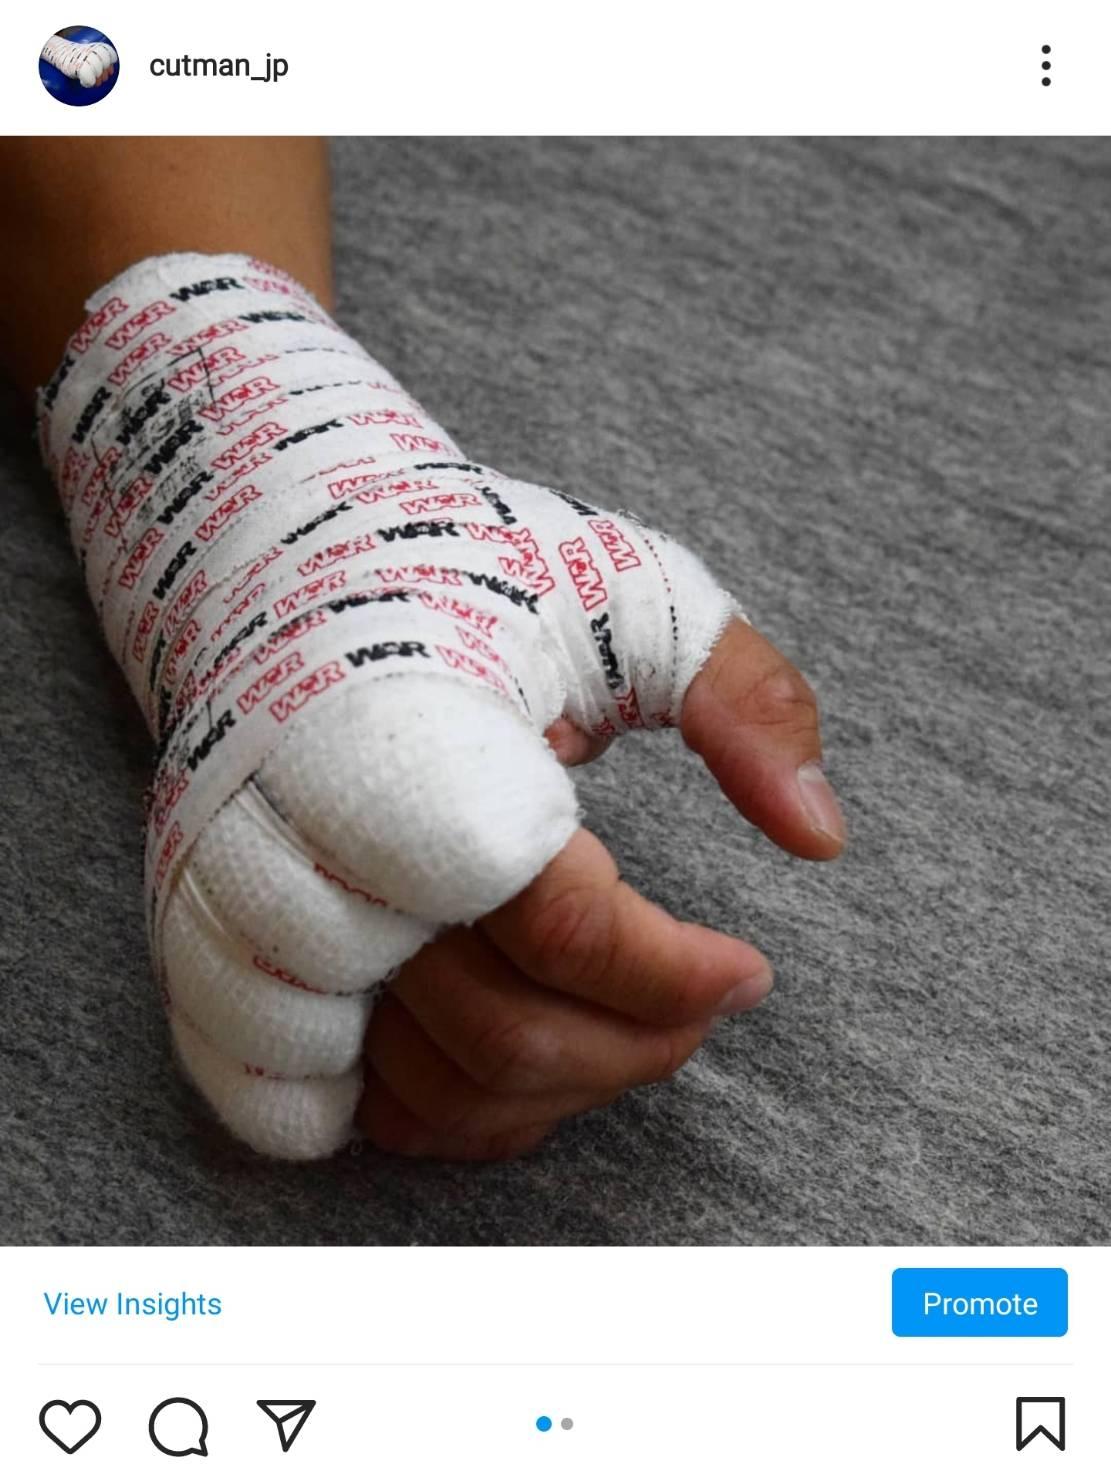 nagasue handwraps